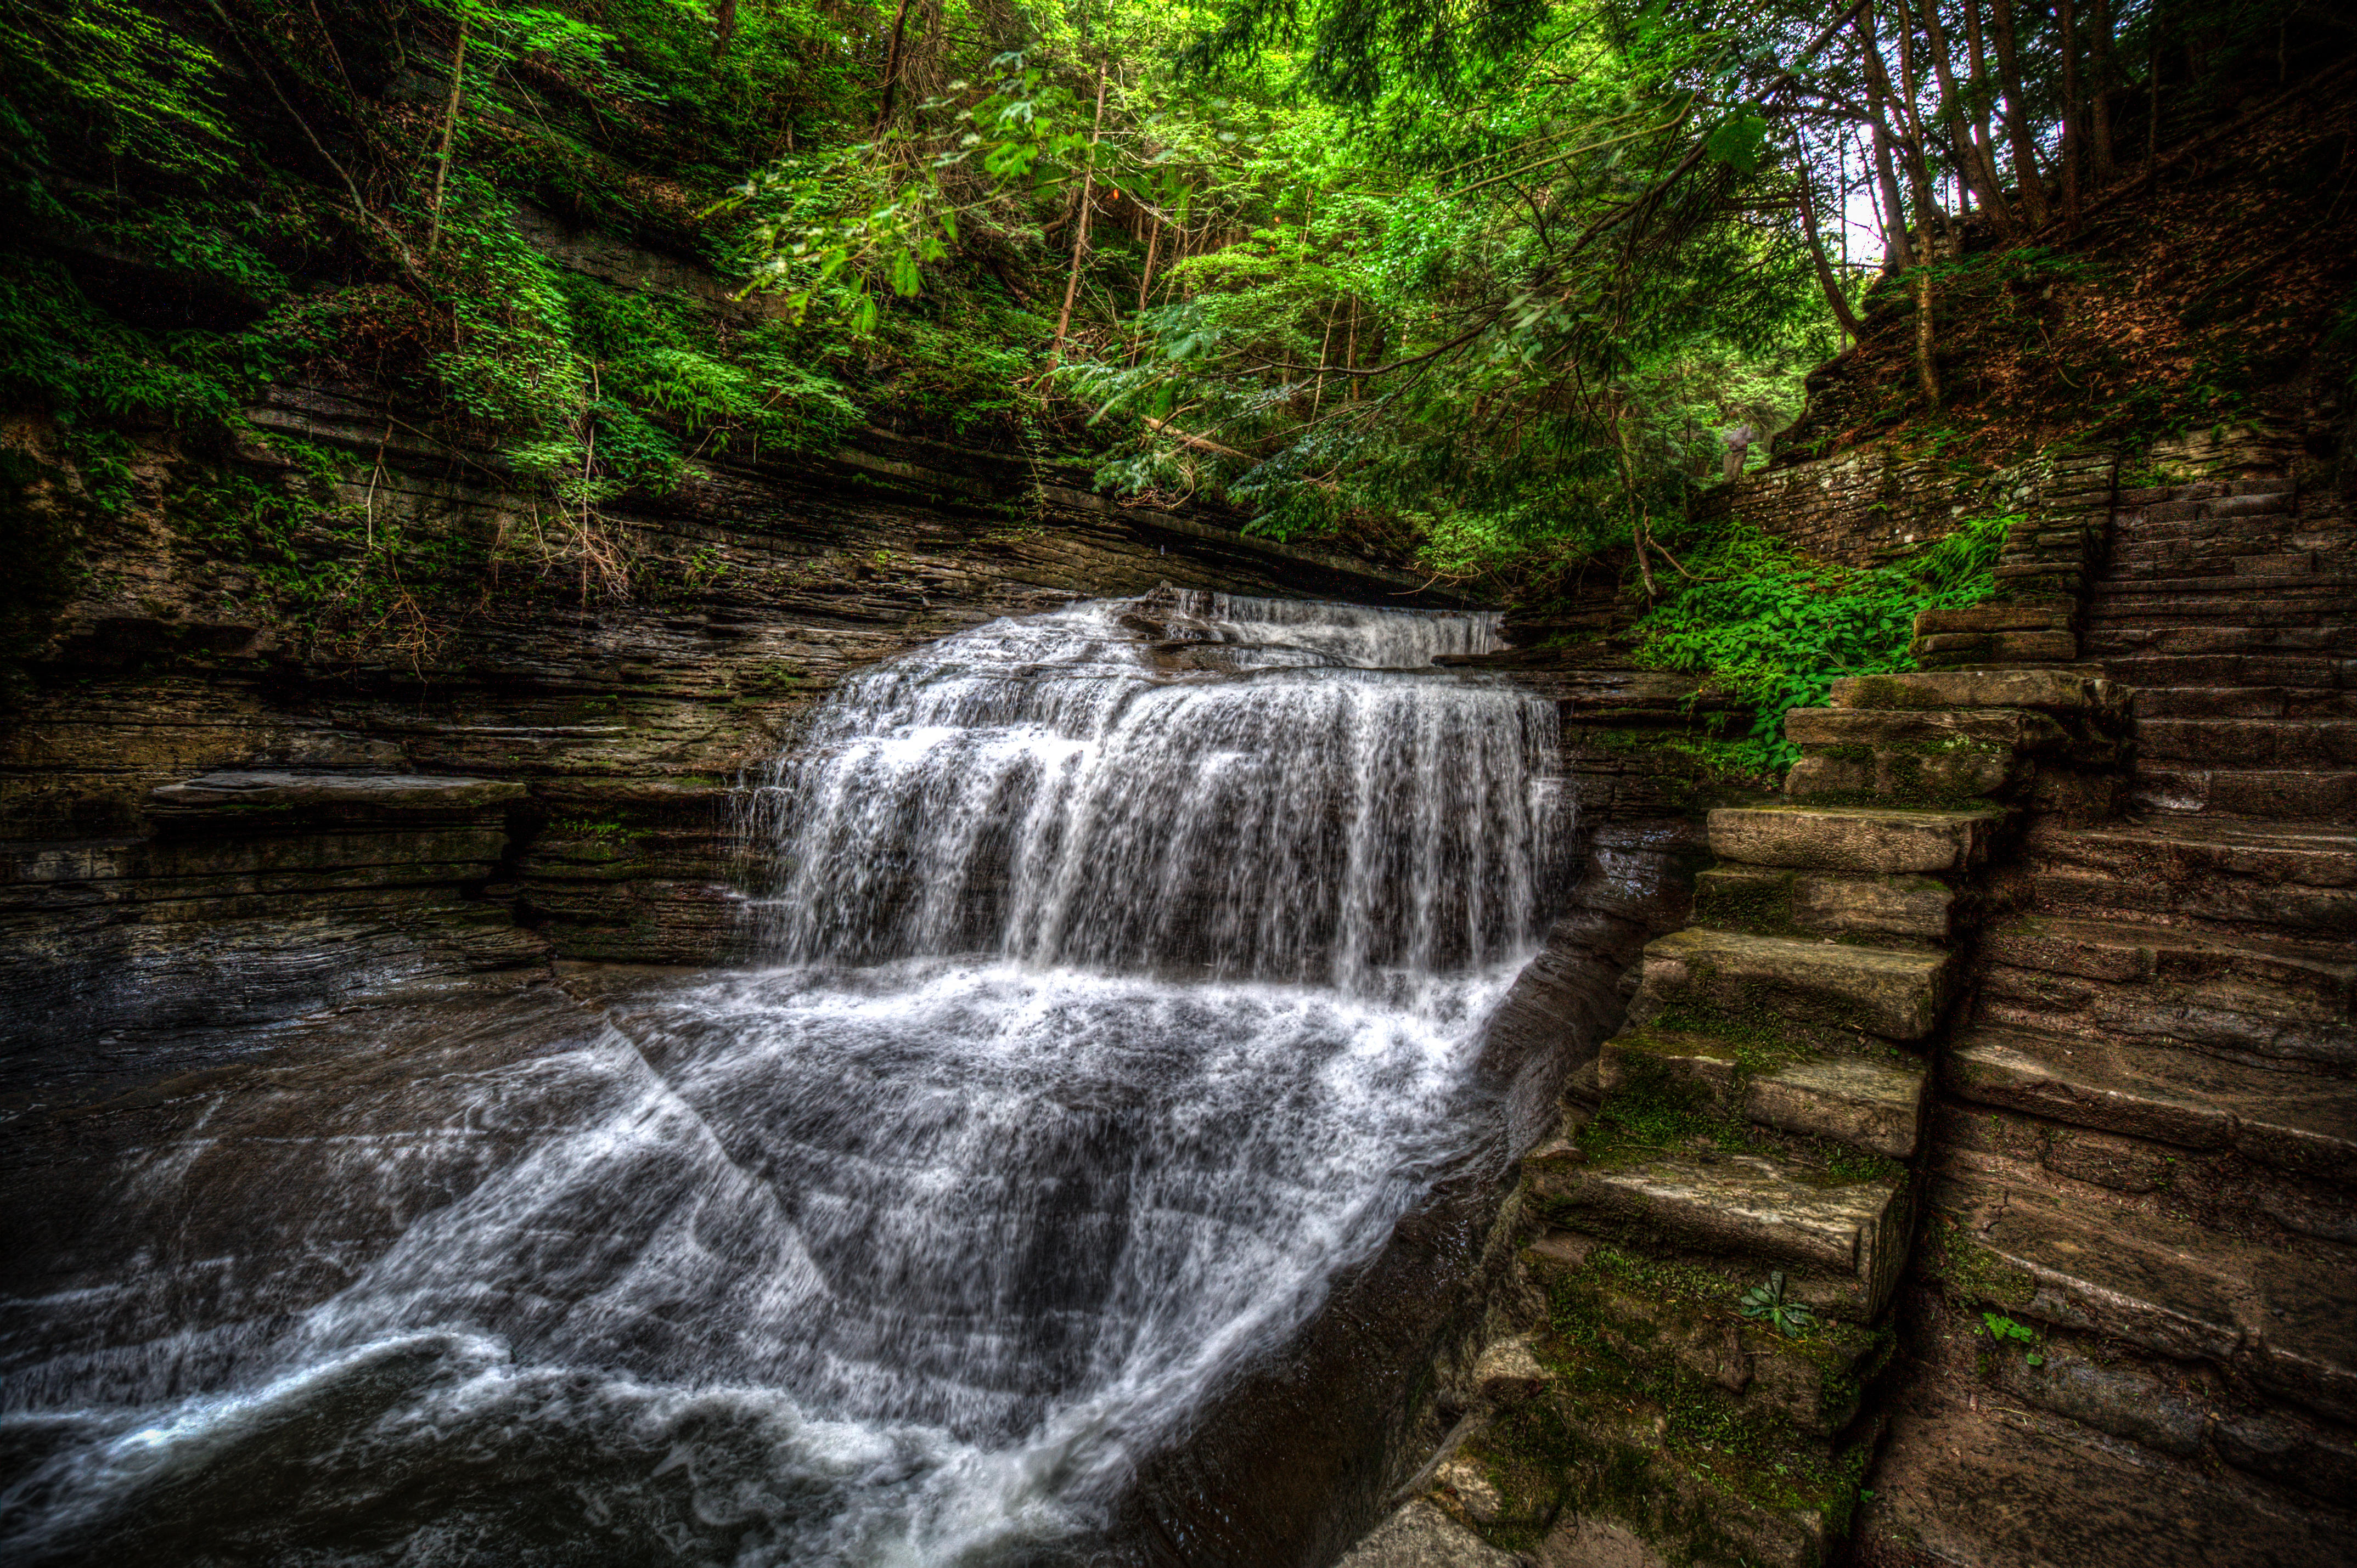 обои водопад, скалы, деревья, природа картинки фото